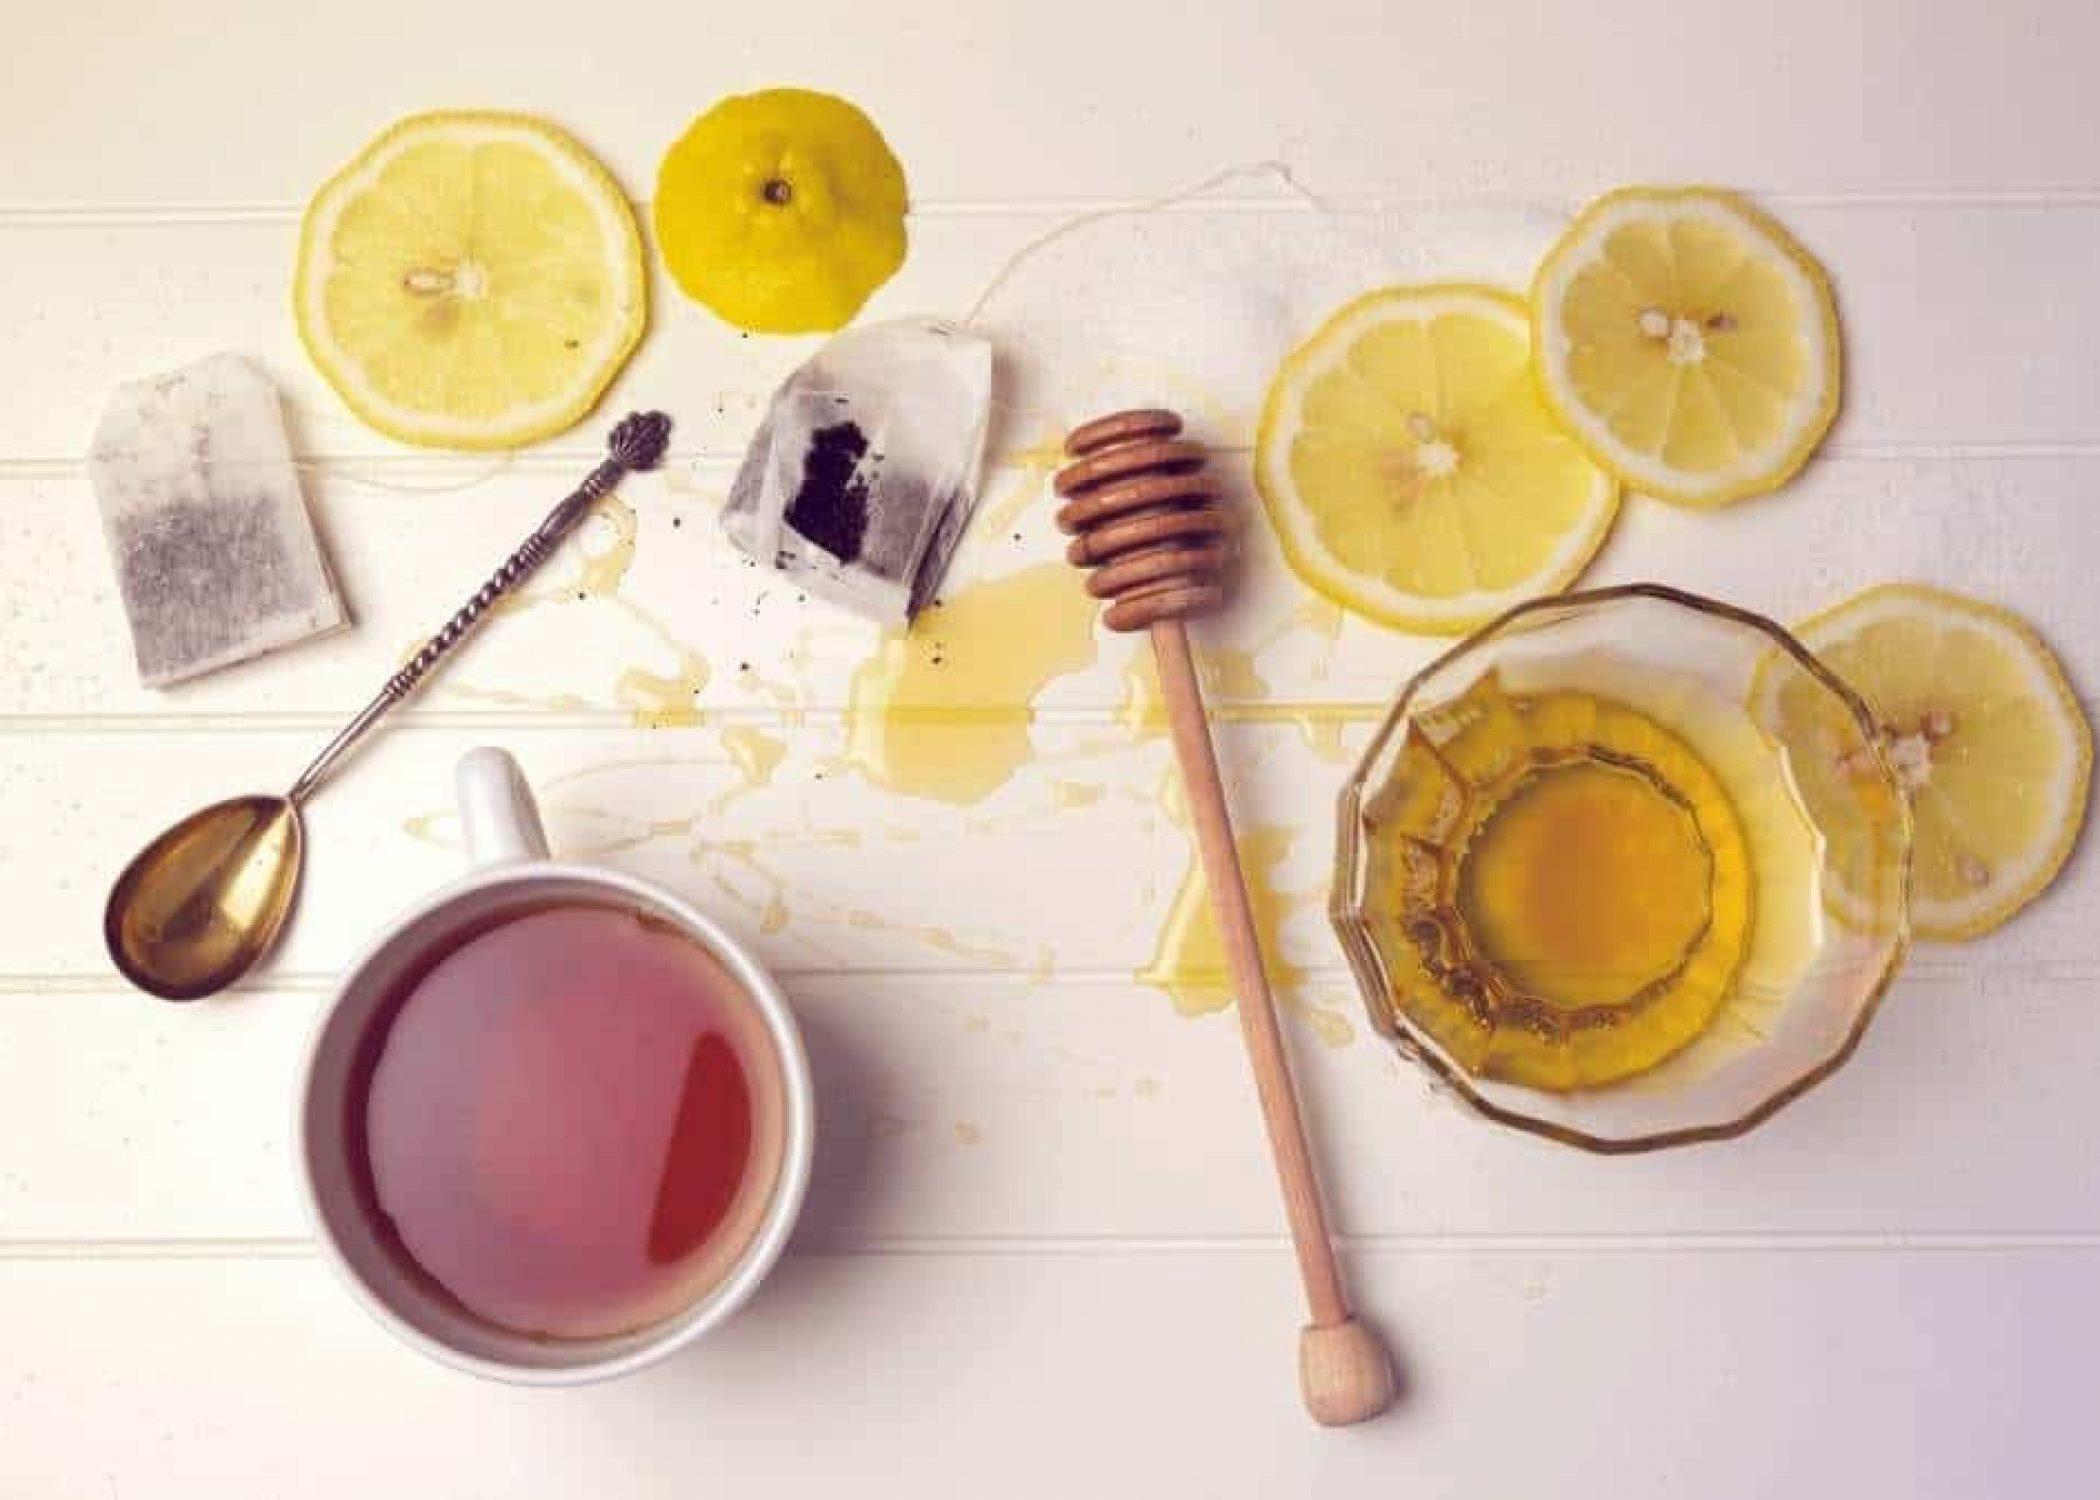 How To Make Starbucks Medicine Ball Tea At Home